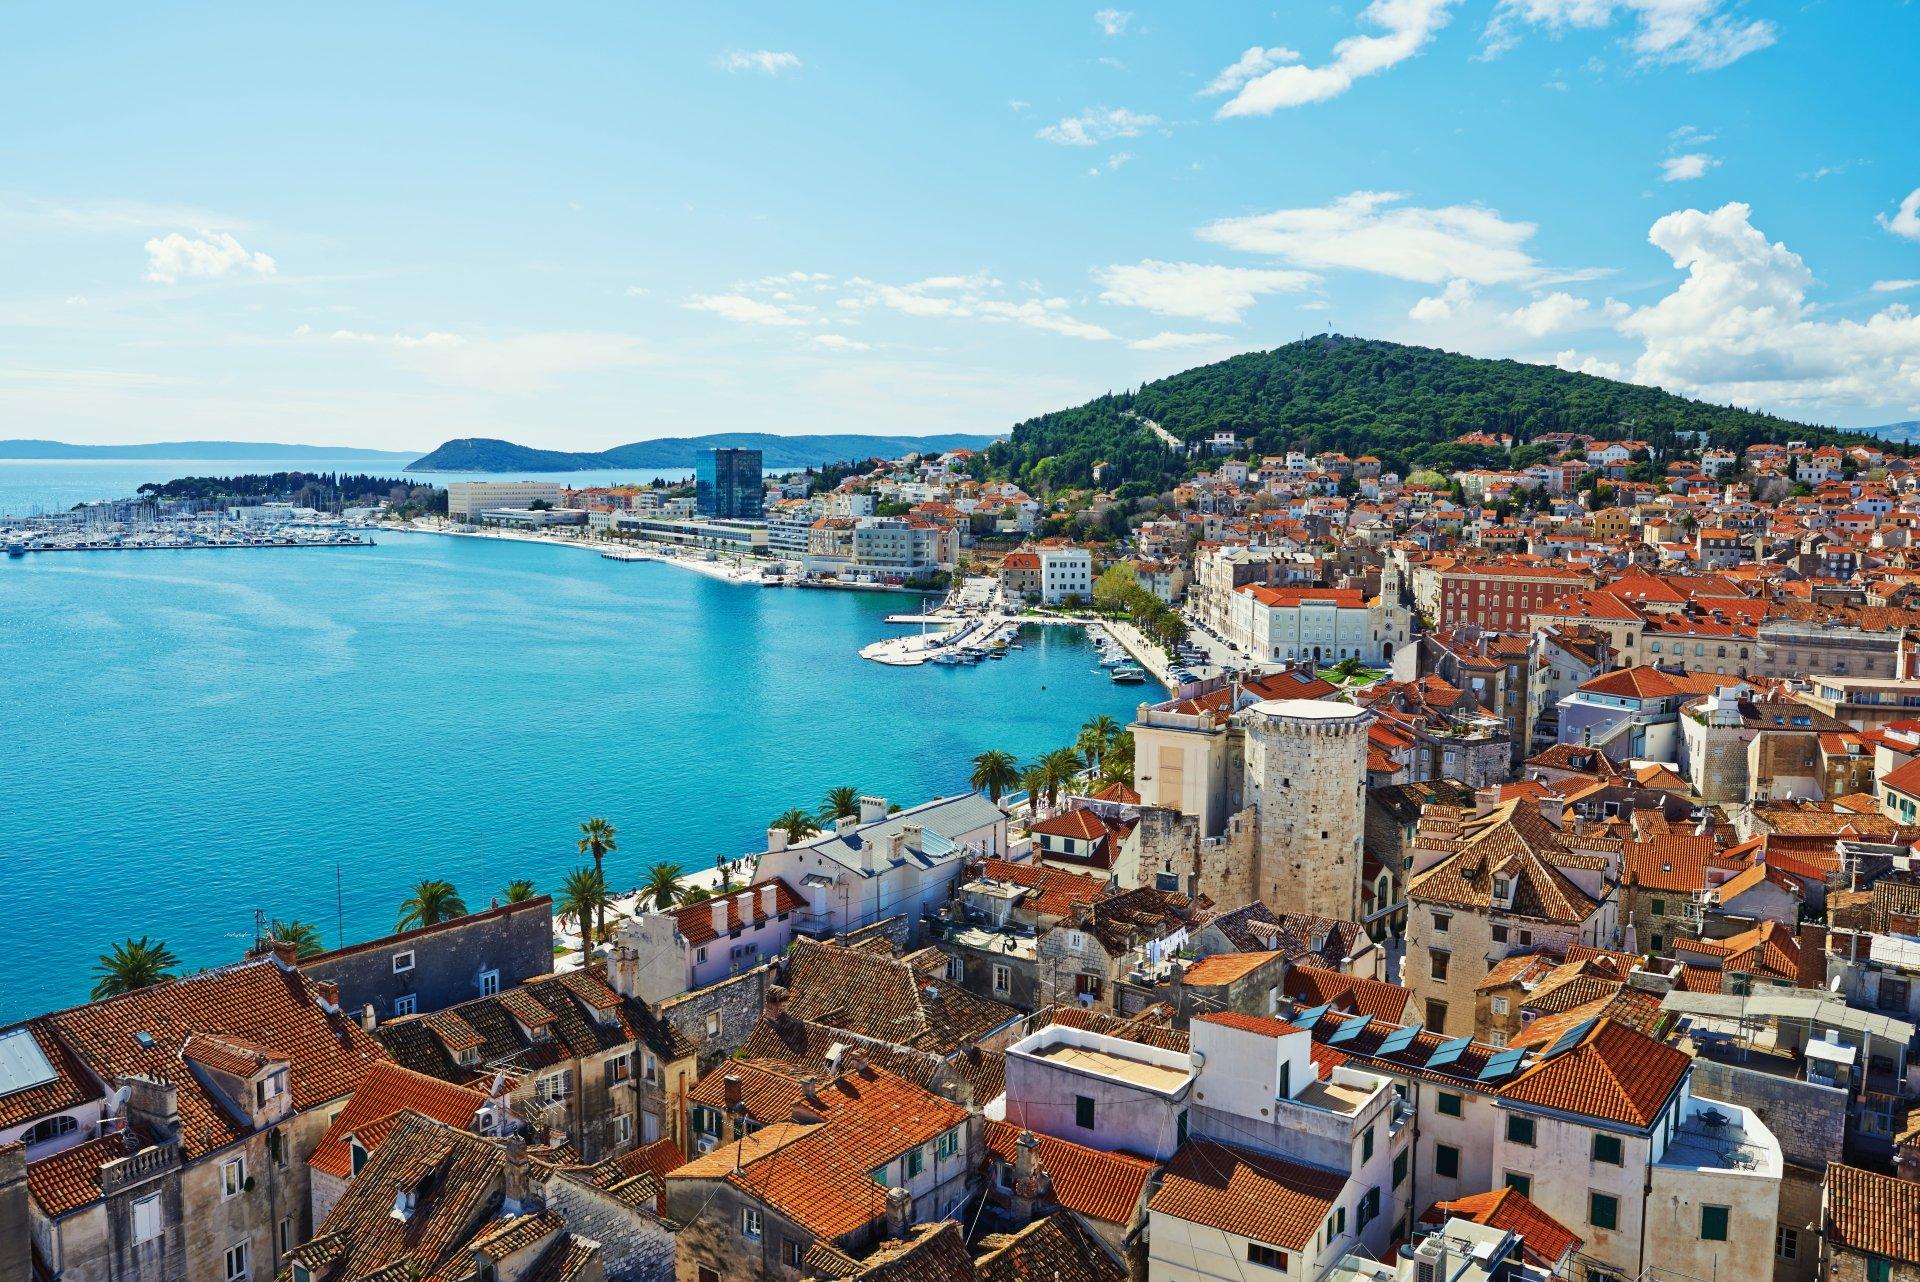 Man Made - City  House Town Coast Croatia Ocean Sea Wallpaper